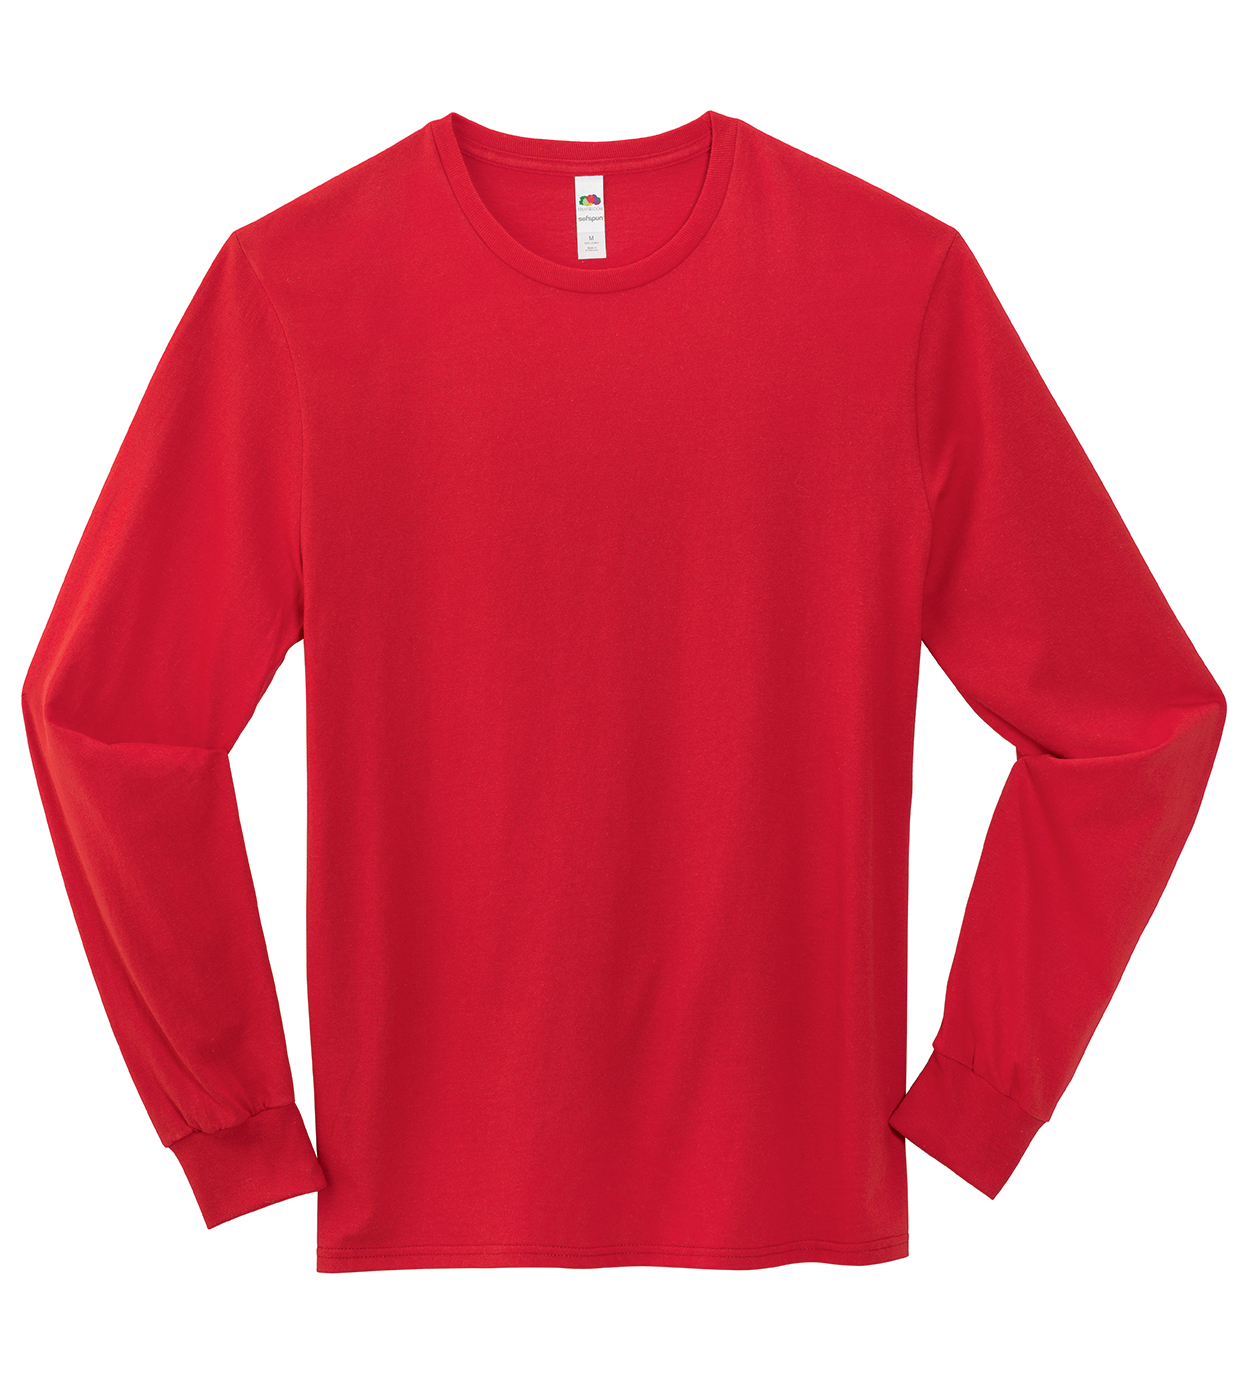 91b19a316fe0d Fruit Of The Loom Long Sleeve T Shirts Walmart | Saddha